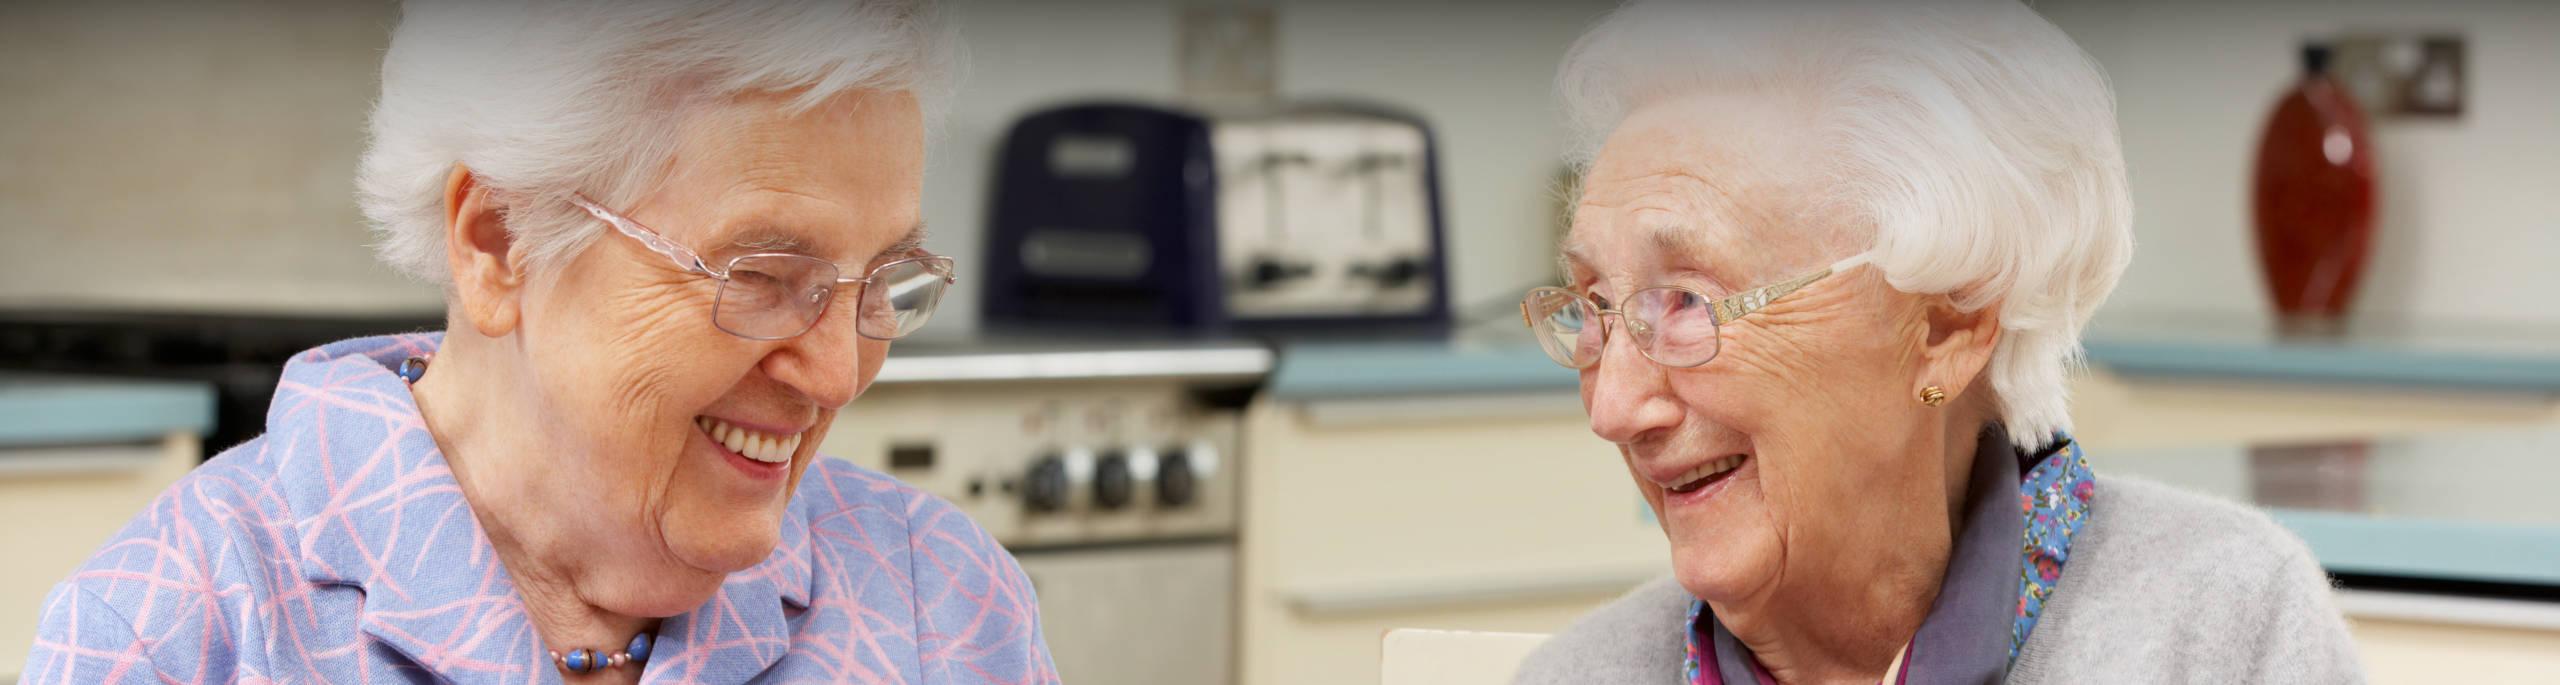 Seniorendomizile und Pflegeheime in Osteuropa